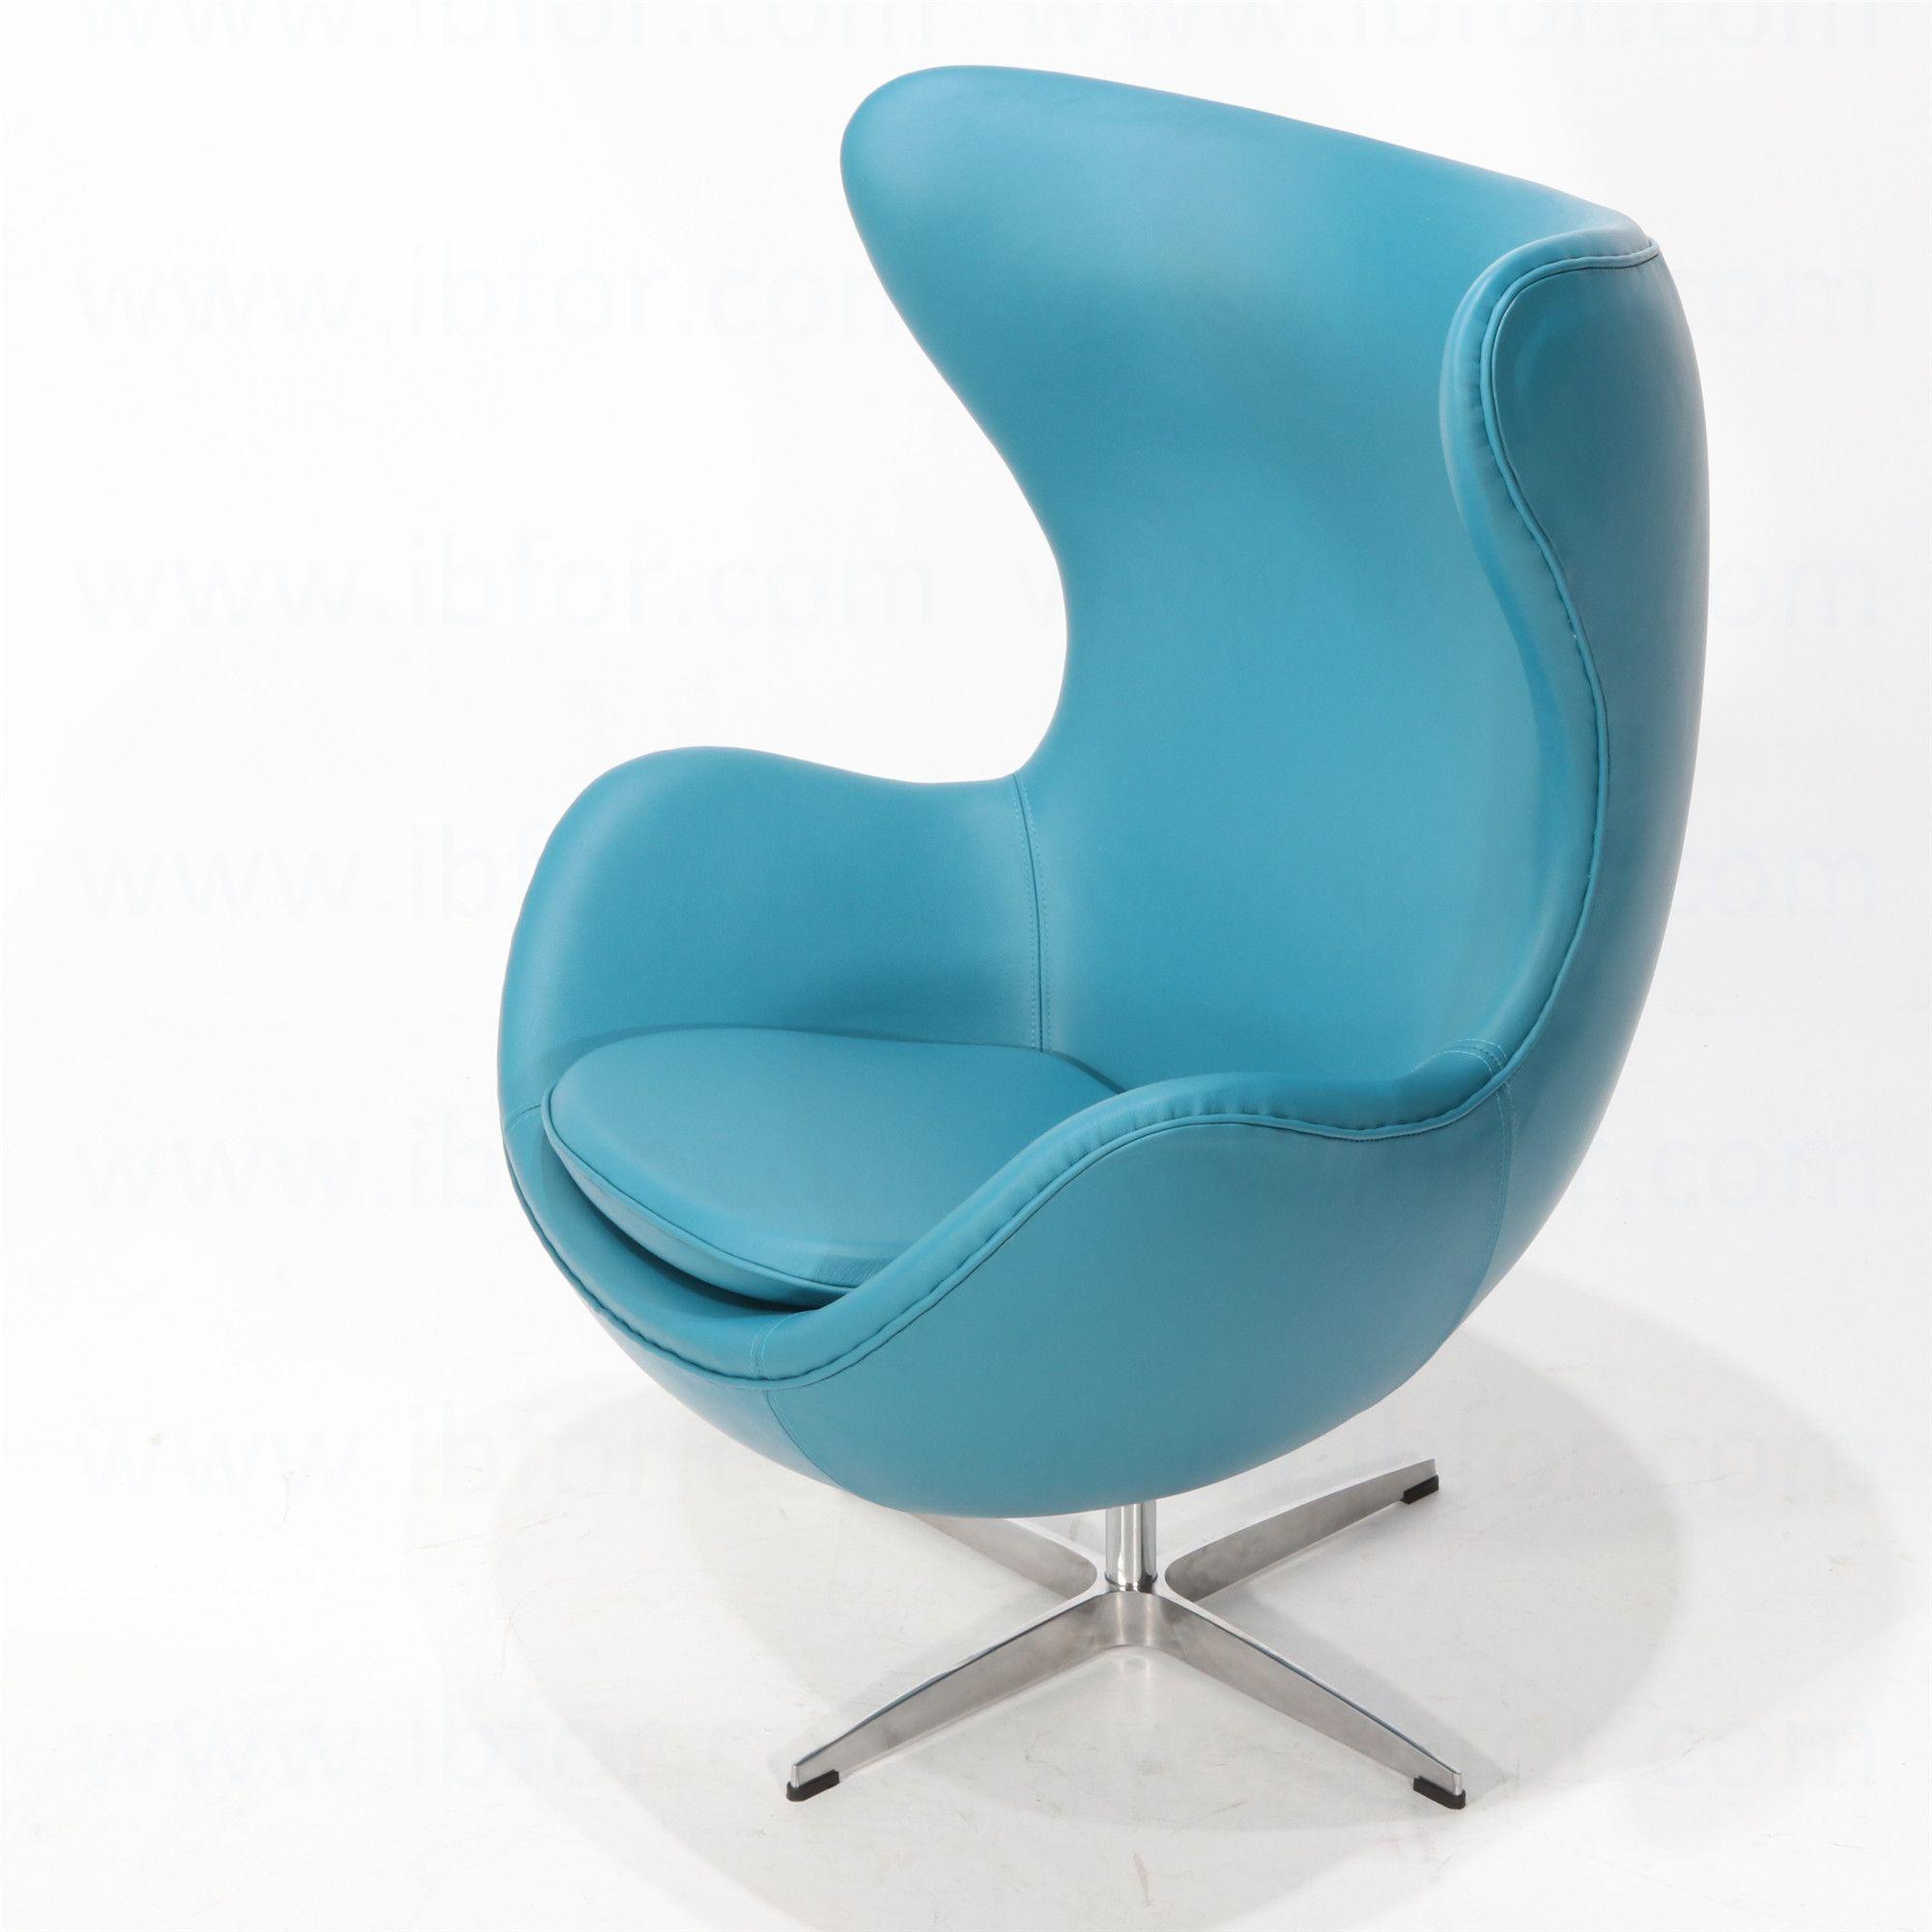 Poltrona Egg Di Jacobsen.Poltrona Egg Chair Pelle Cashmere Sedia Ovale Poltrone Arredamento